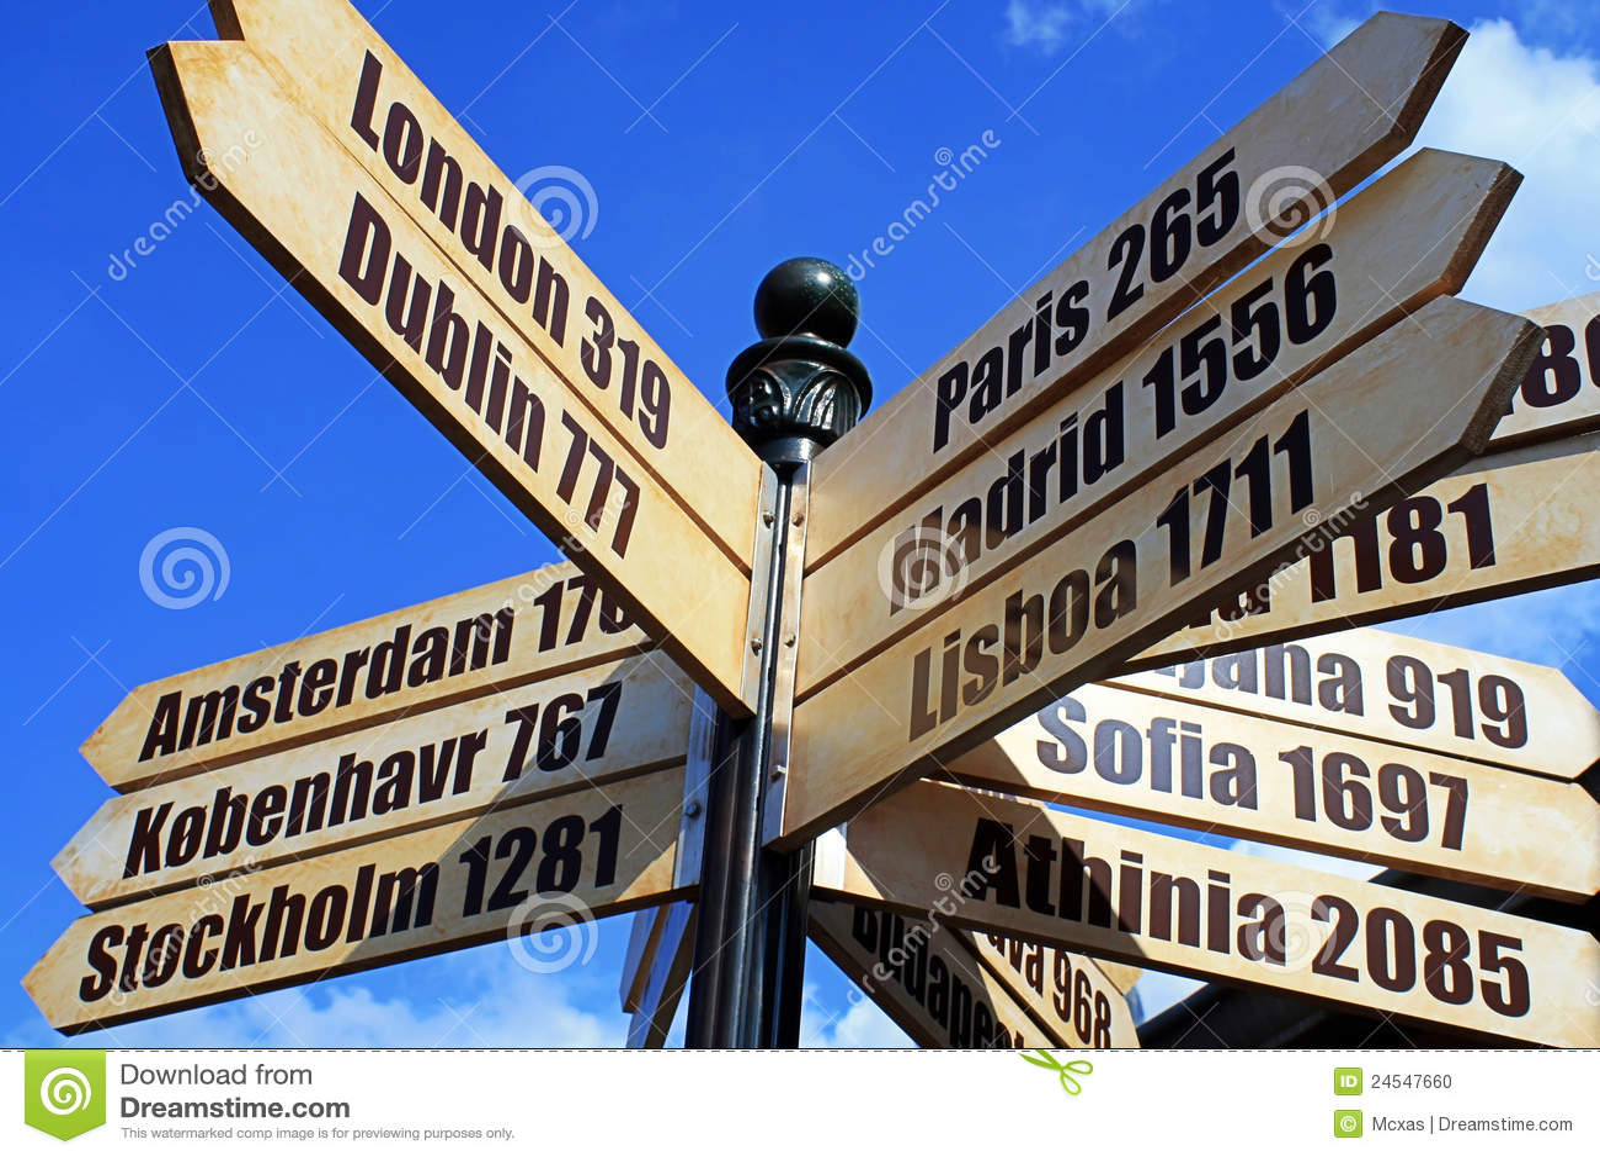 European Cities distance Travel Sign